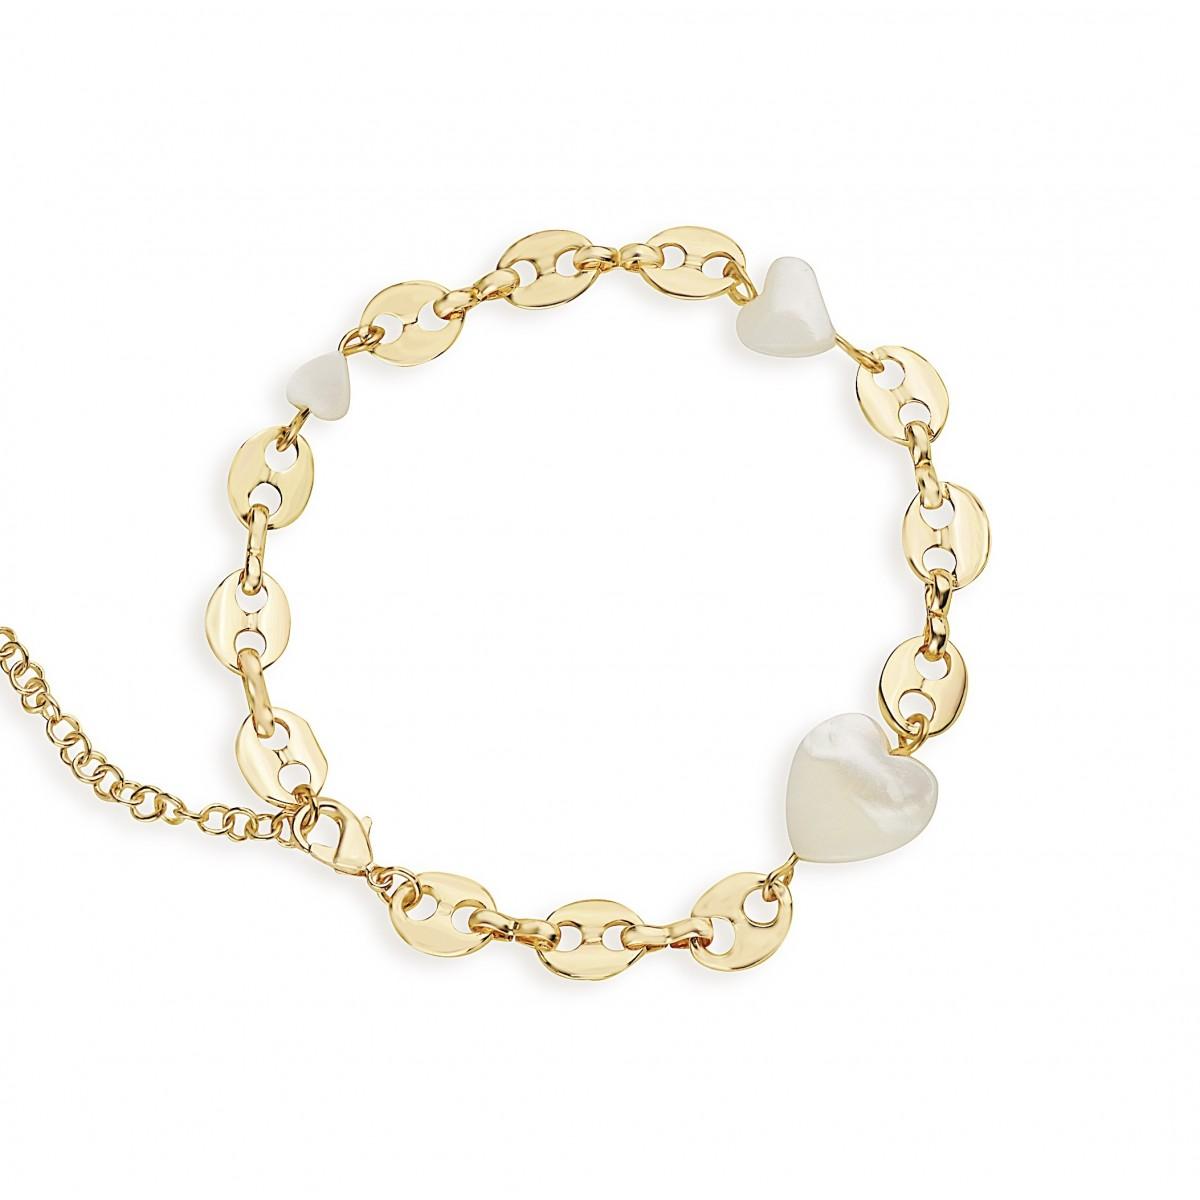 Valerie Chic - I'M YOURS Armband - 18 Karat vergoldet